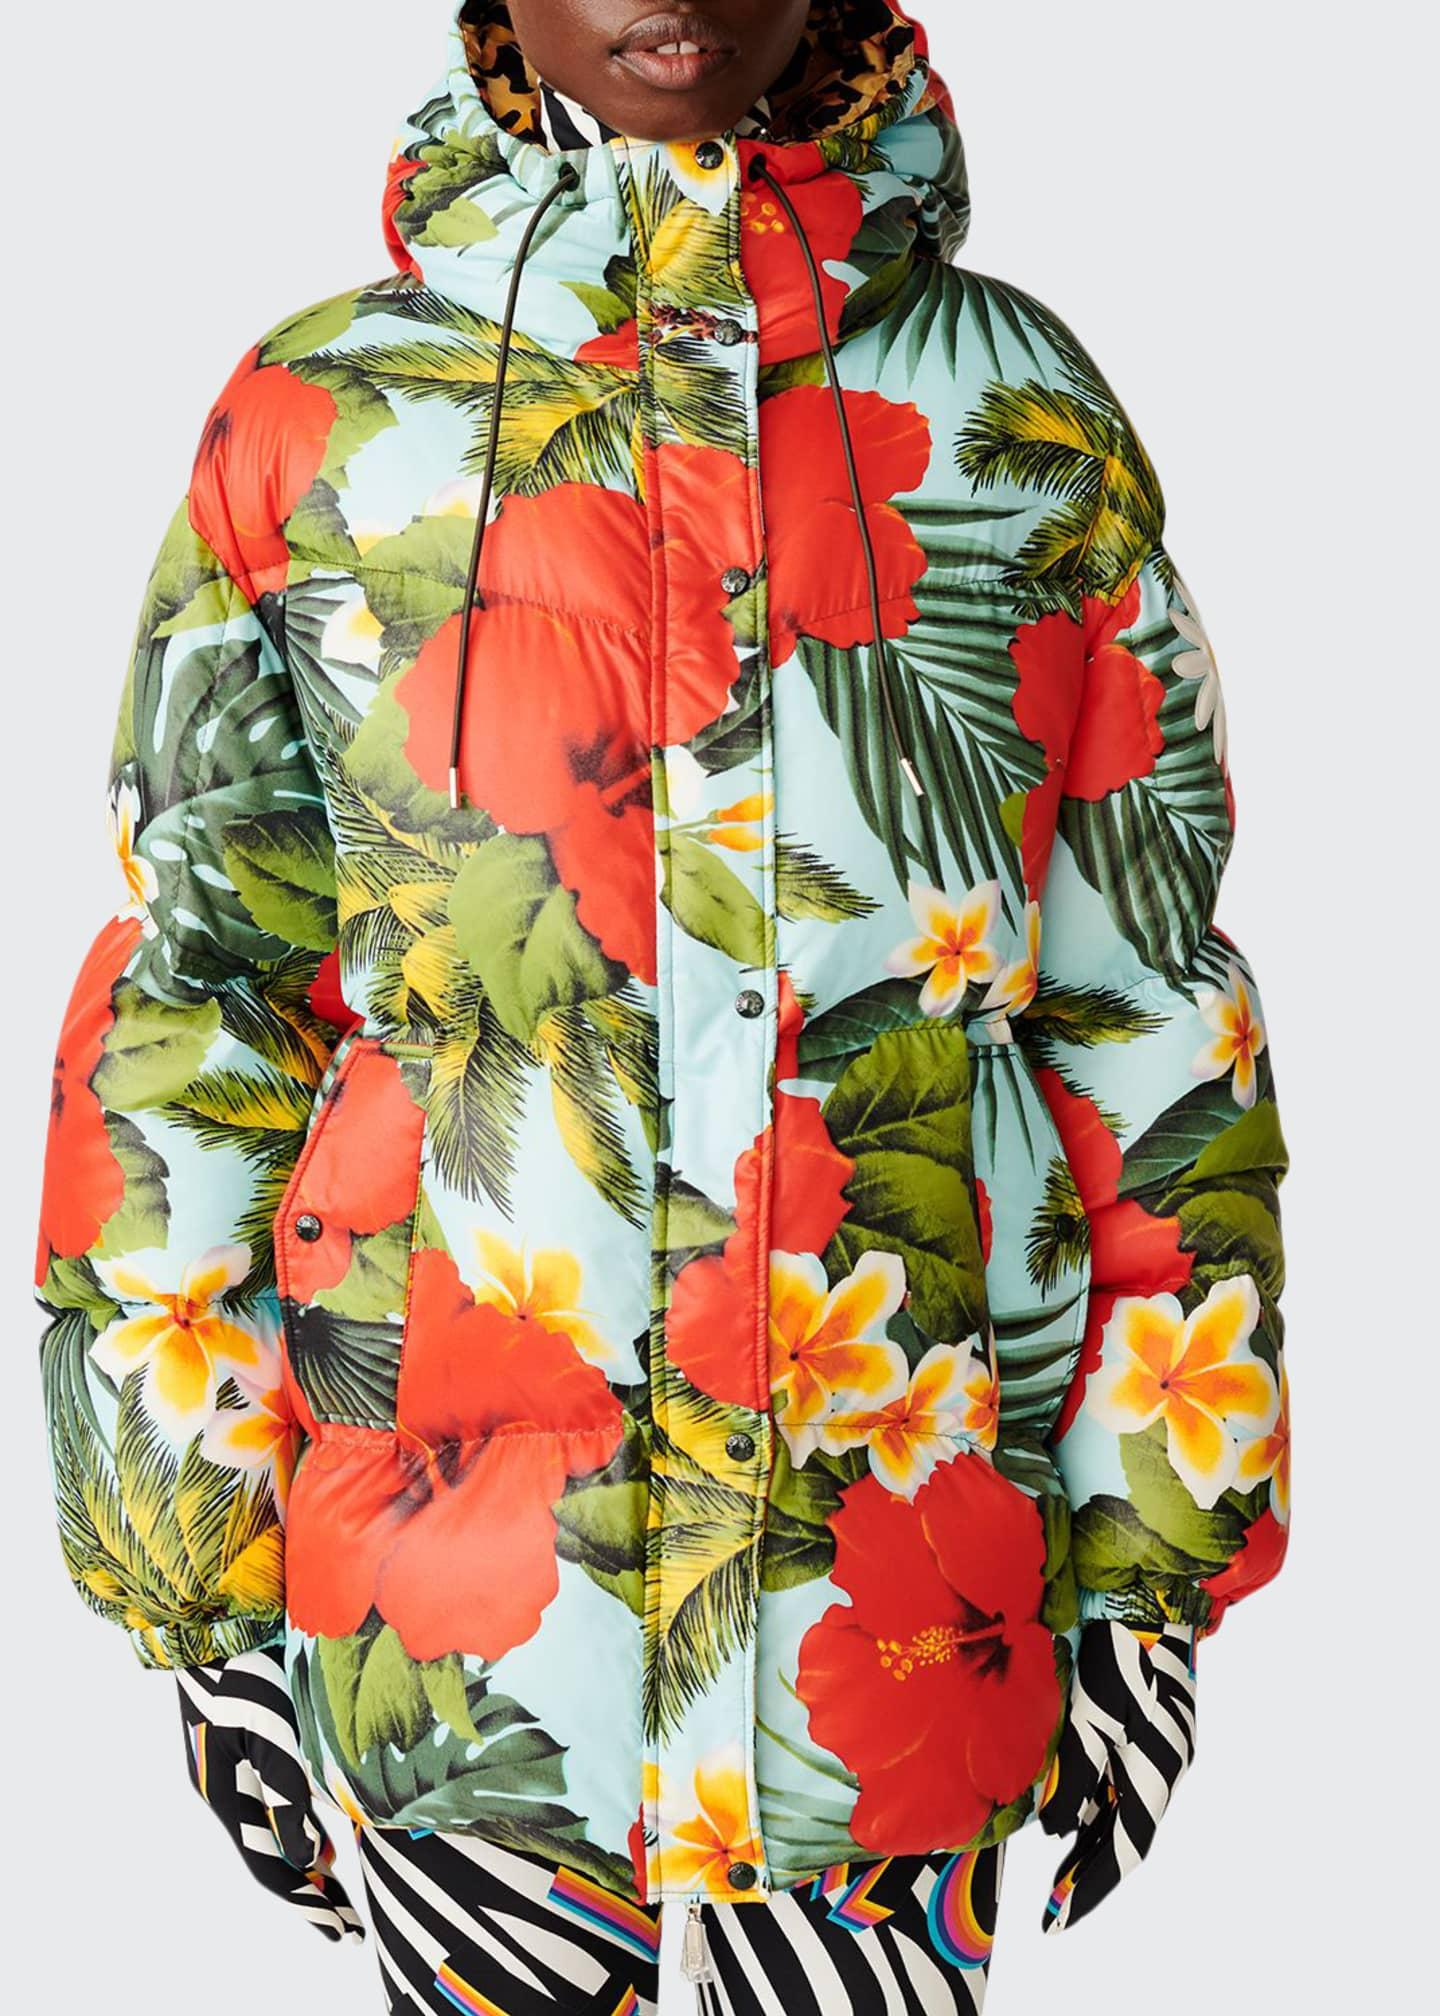 Moncler Genius Richard Quinn Mary Floral Puffer Jacket